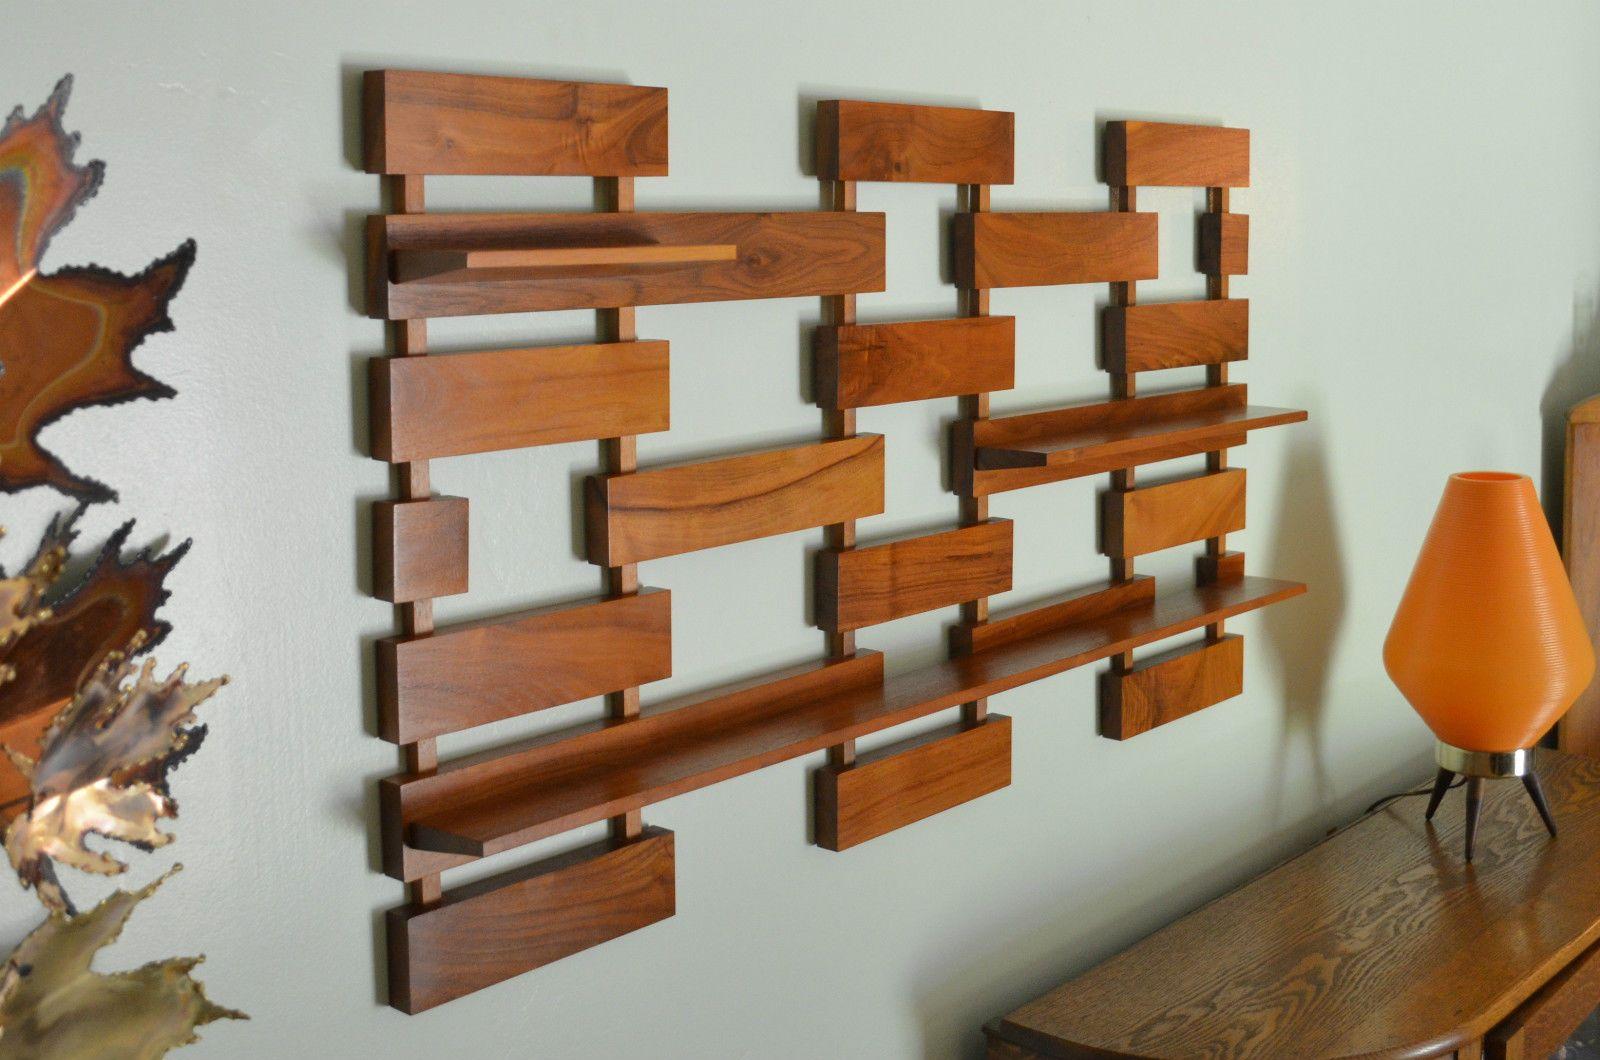 Mid Century Modern Wall Art vintage belart co. wall shelf teak wood mid century modern | my